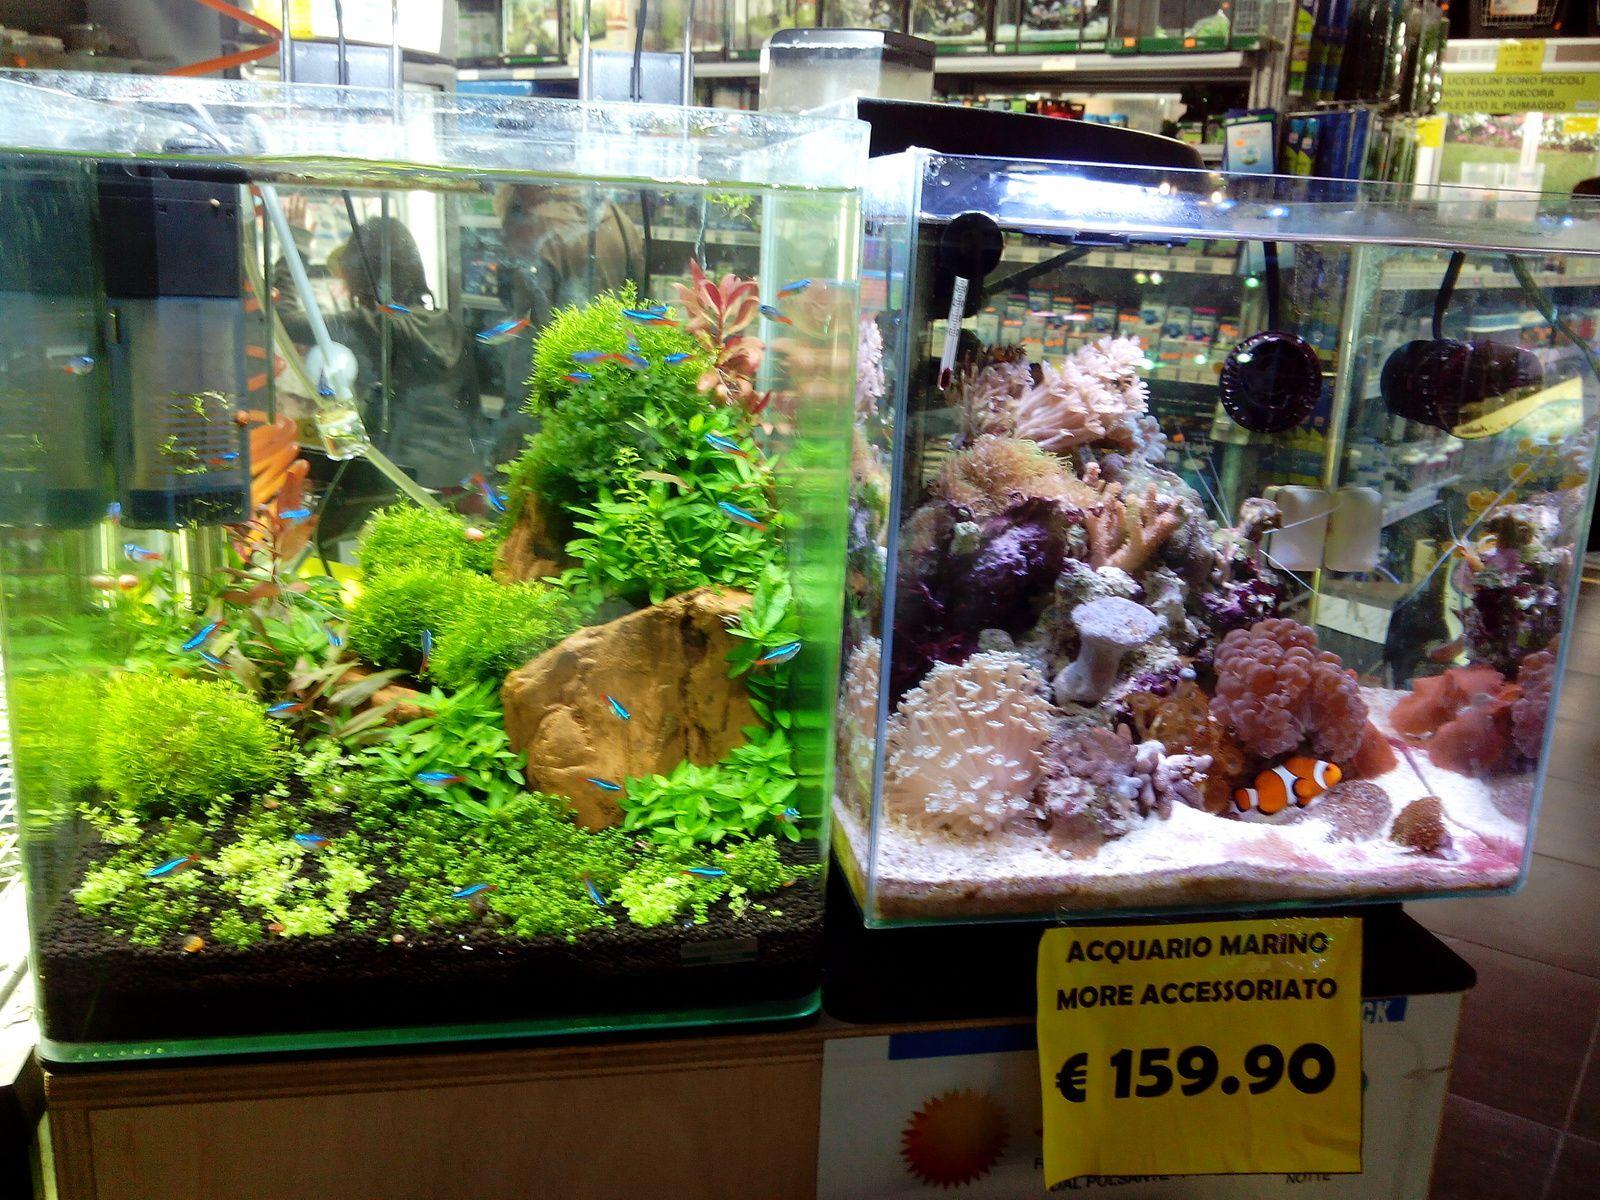 Vizita la MobyDick Acquari e Animali(Fiumicino-Parco Leonardo)